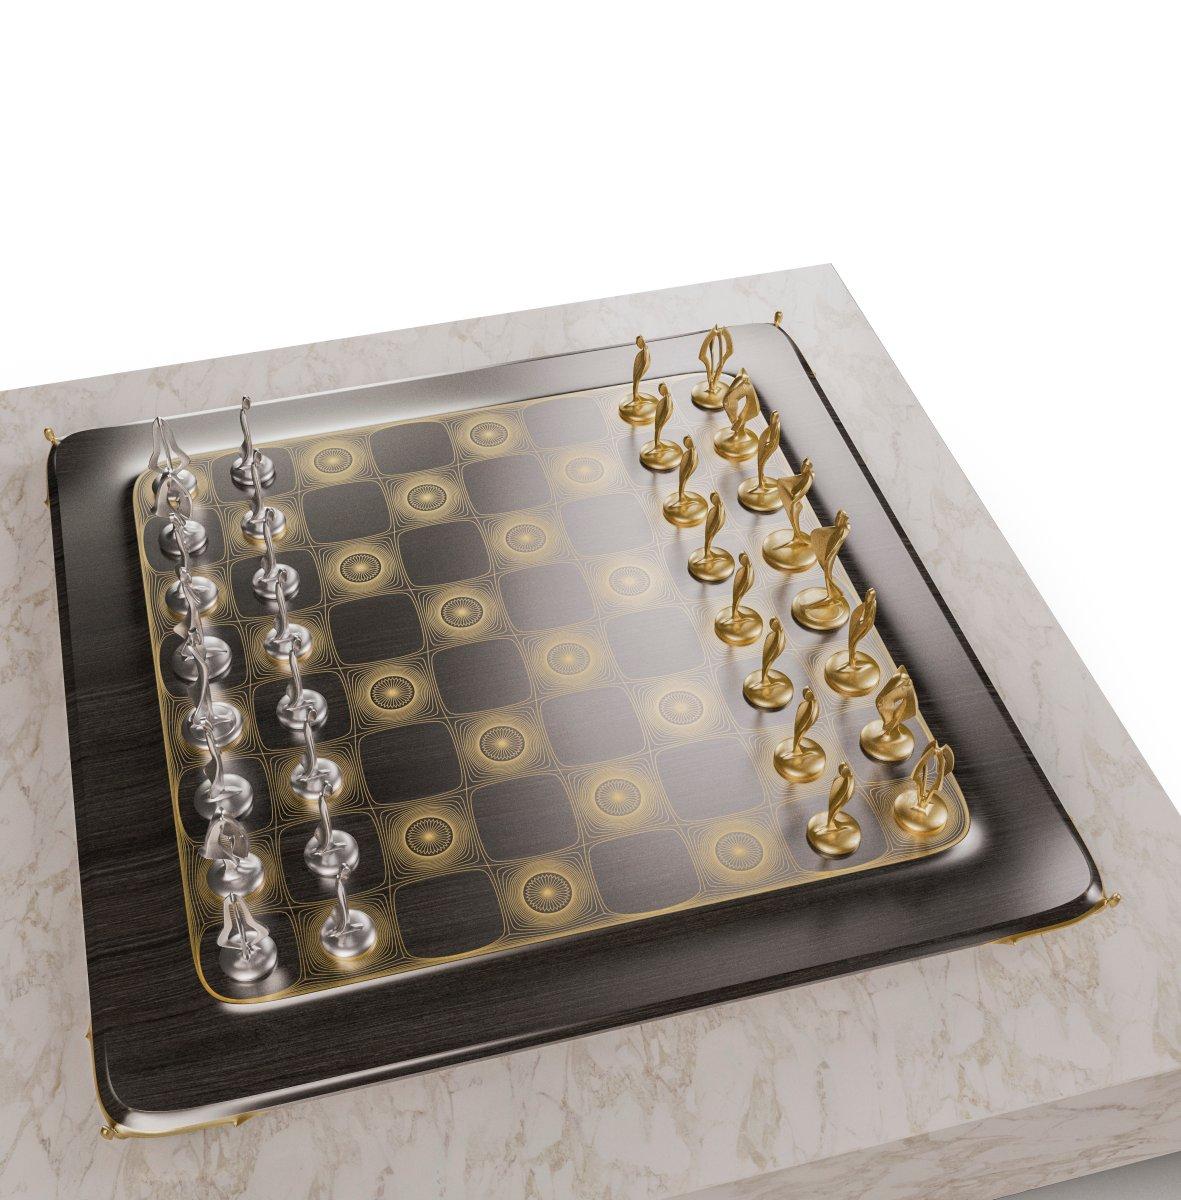 Pandov Chess Set with ChessBoard....  #chess #pandov #chessset #sculpture #aesthetic #chessbeauty #luxury #art #instaart #beautifulchess #blackandwhite #chessart #chessdesign #amazingdesign #decorinspiration #decorative #minimaldesign #decorlover #decorhome  #luxurygift #mind